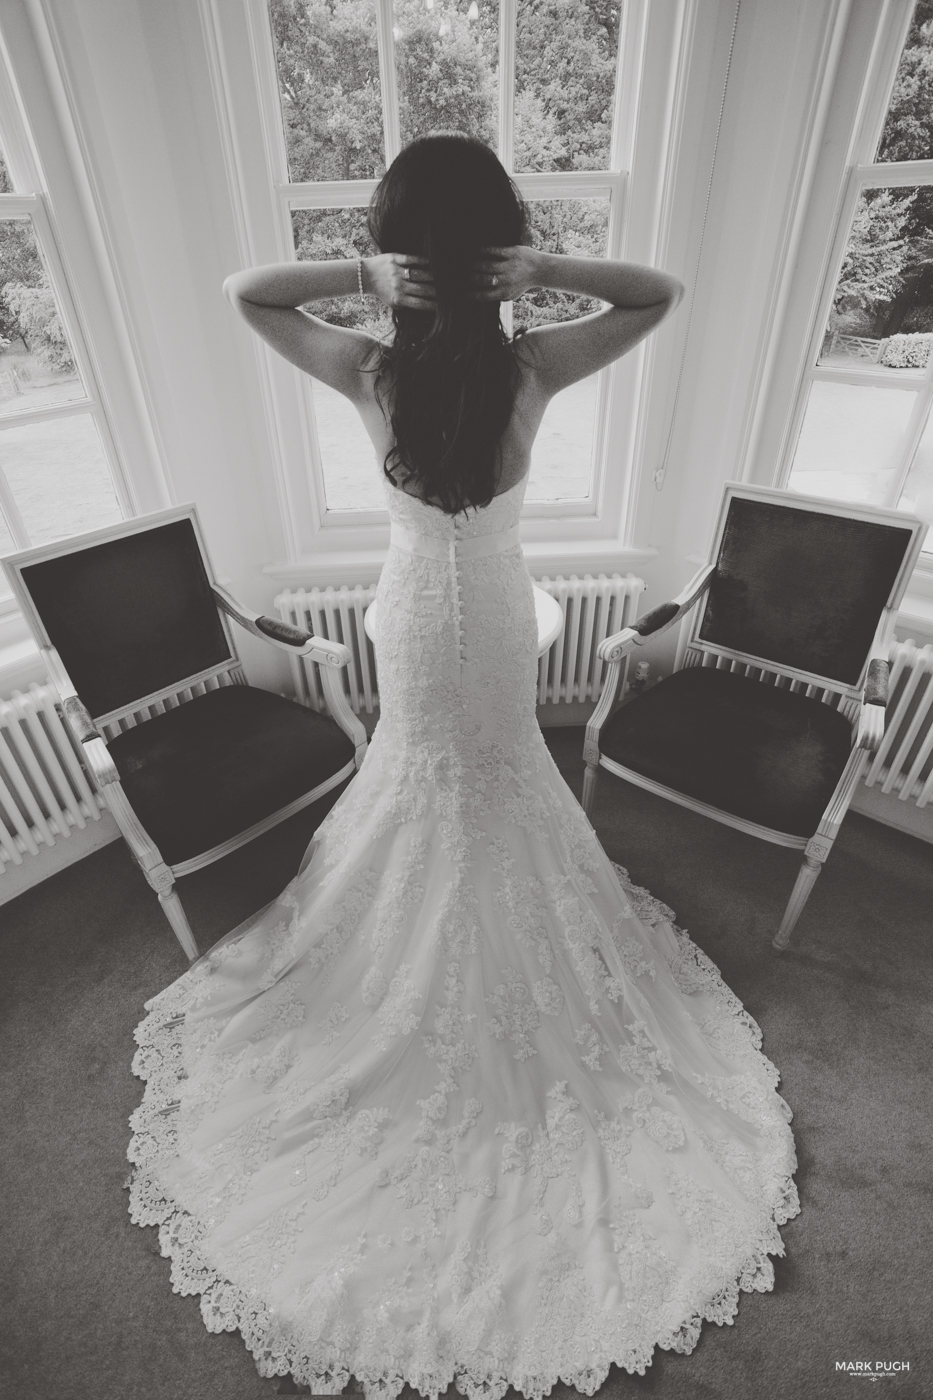 042 Wedding Photography Award winning Wedding Photographer and Videographer Mark Pugh www.markpugh.com.JPG